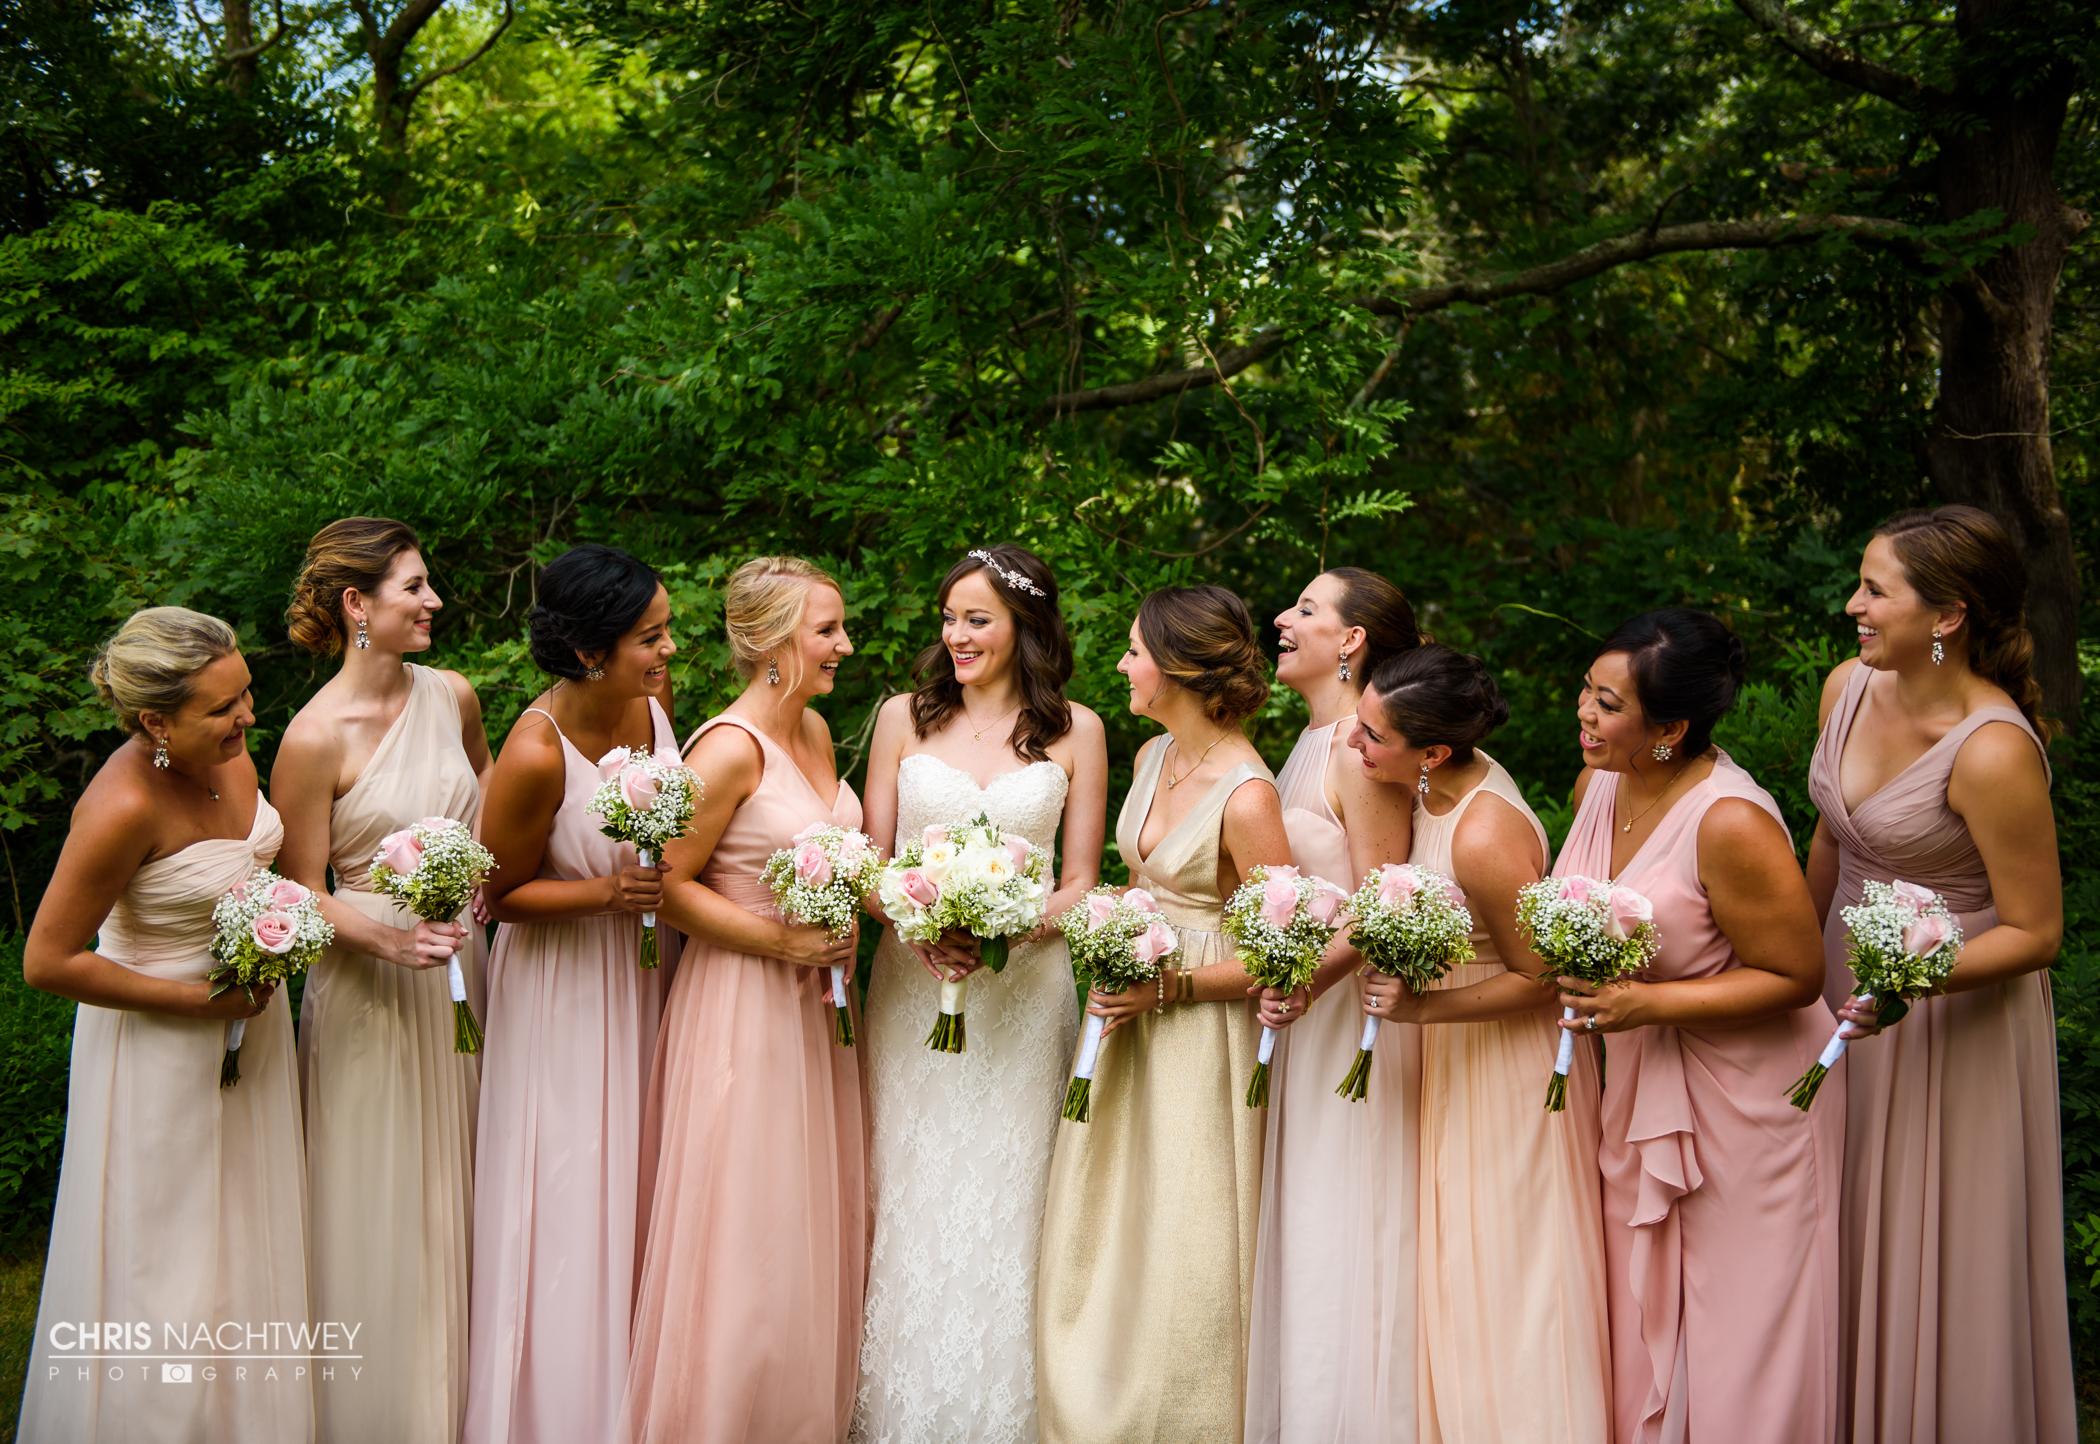 inn-at-mystic-connecticut-wedding-photographer-chris-nachtwey-7.jpg